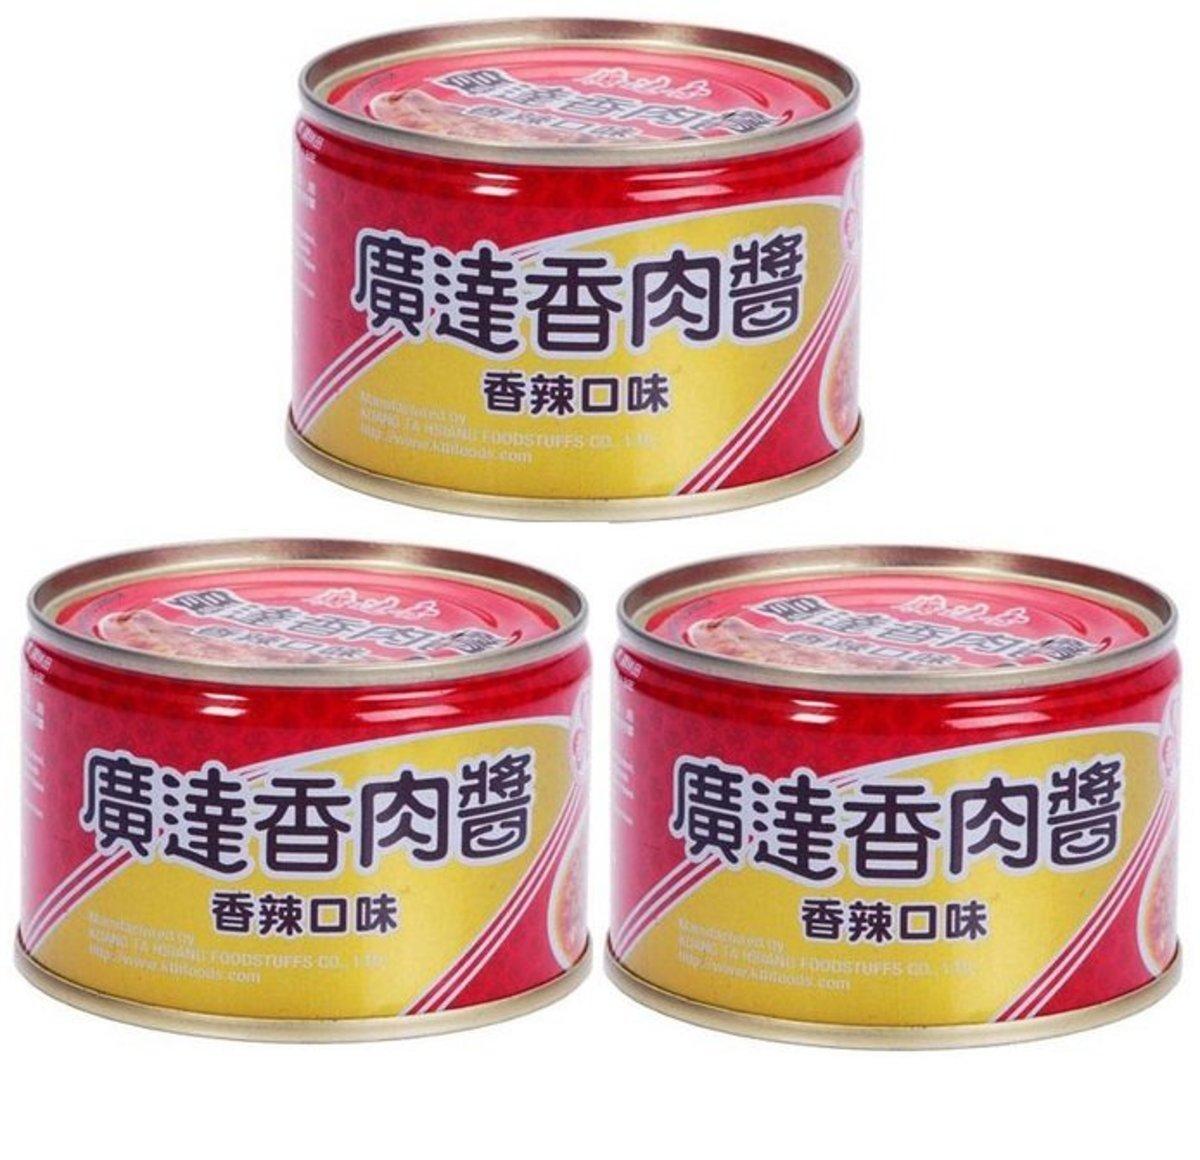 Taiwan Kuang Ta Hsiang Fried Pork Paste Hot Taste 160 x 3 (25217)